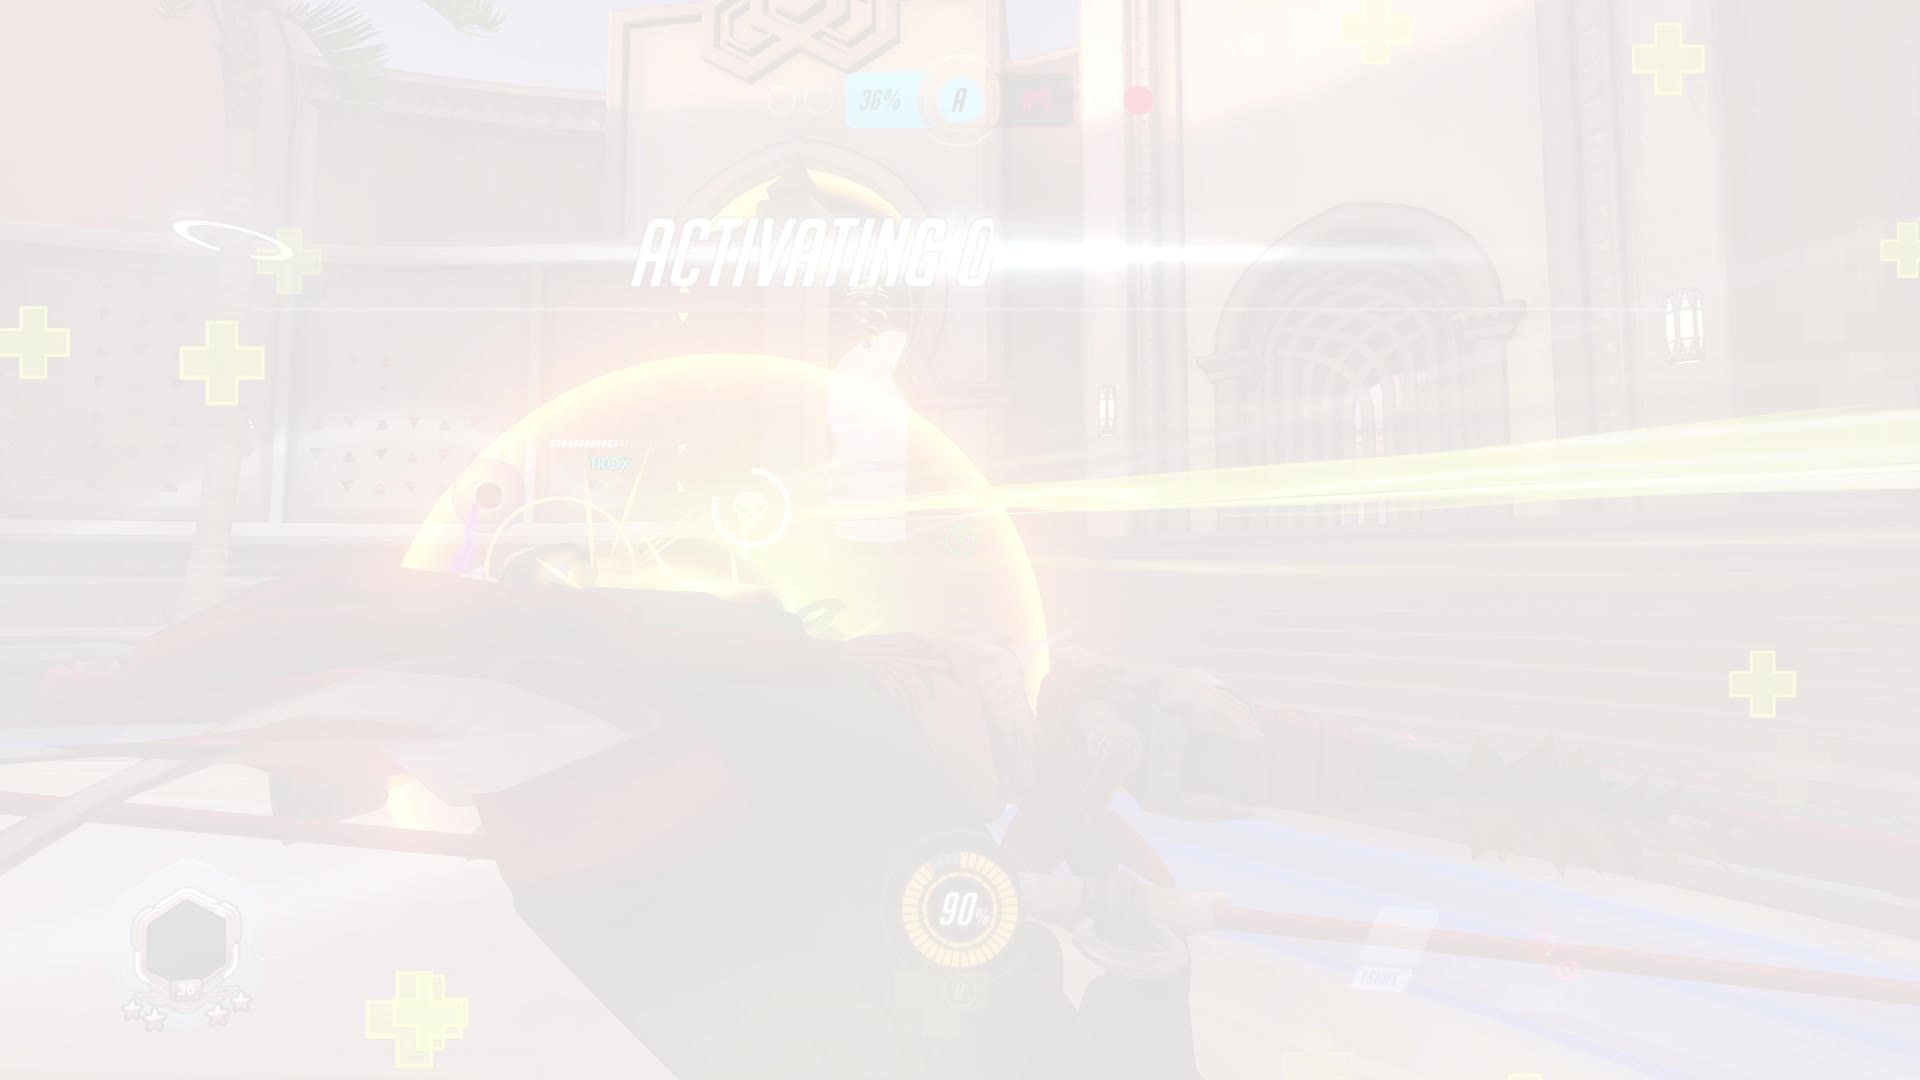 hanzo, highlight, overwatch, john cenas GIFs